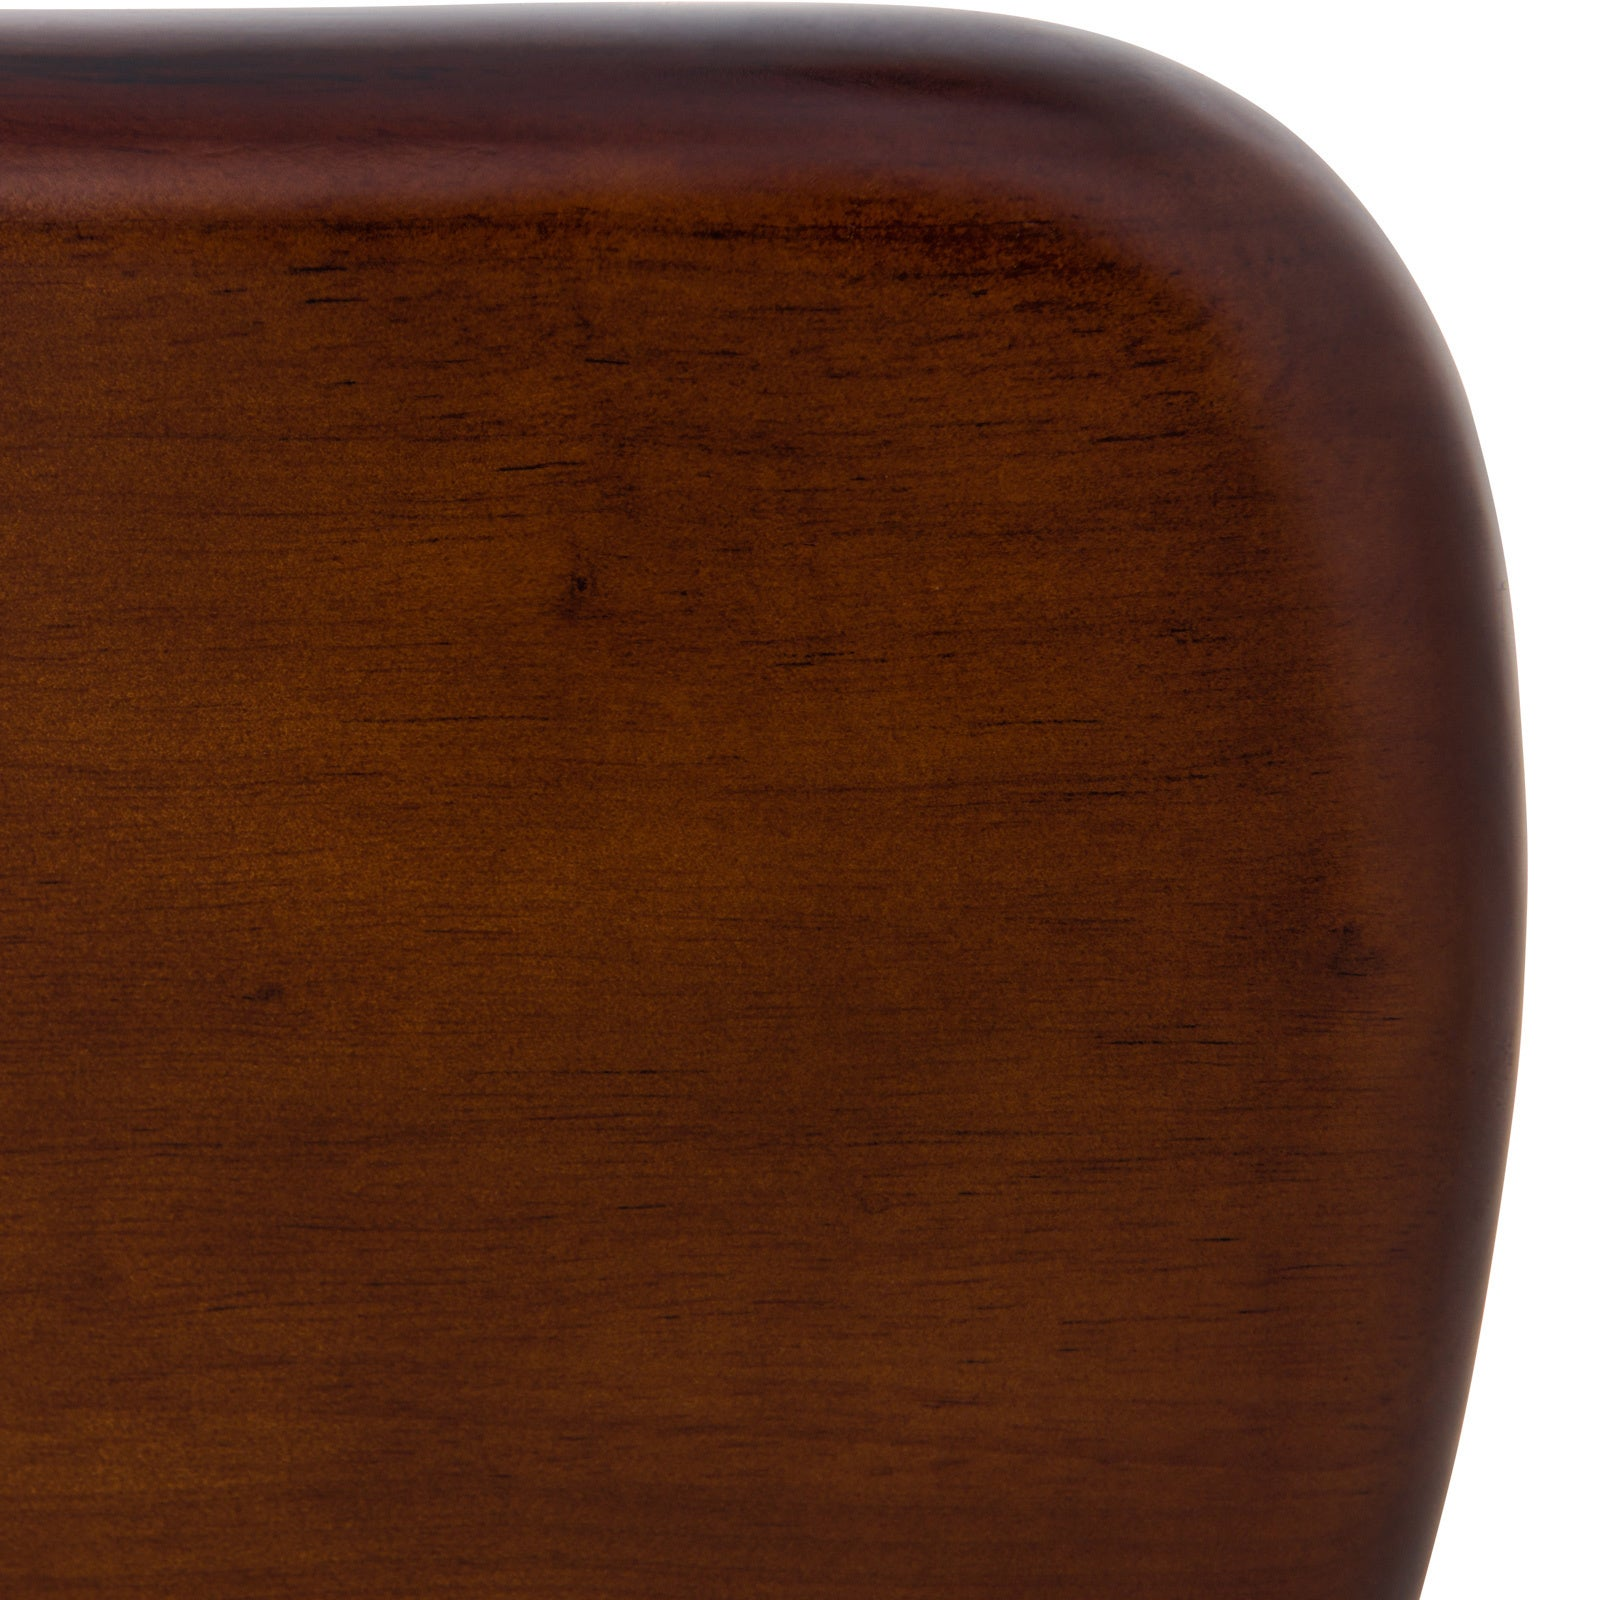 LeisureMod Imperial Triangle Coffee Table with Dark Walnut Wood